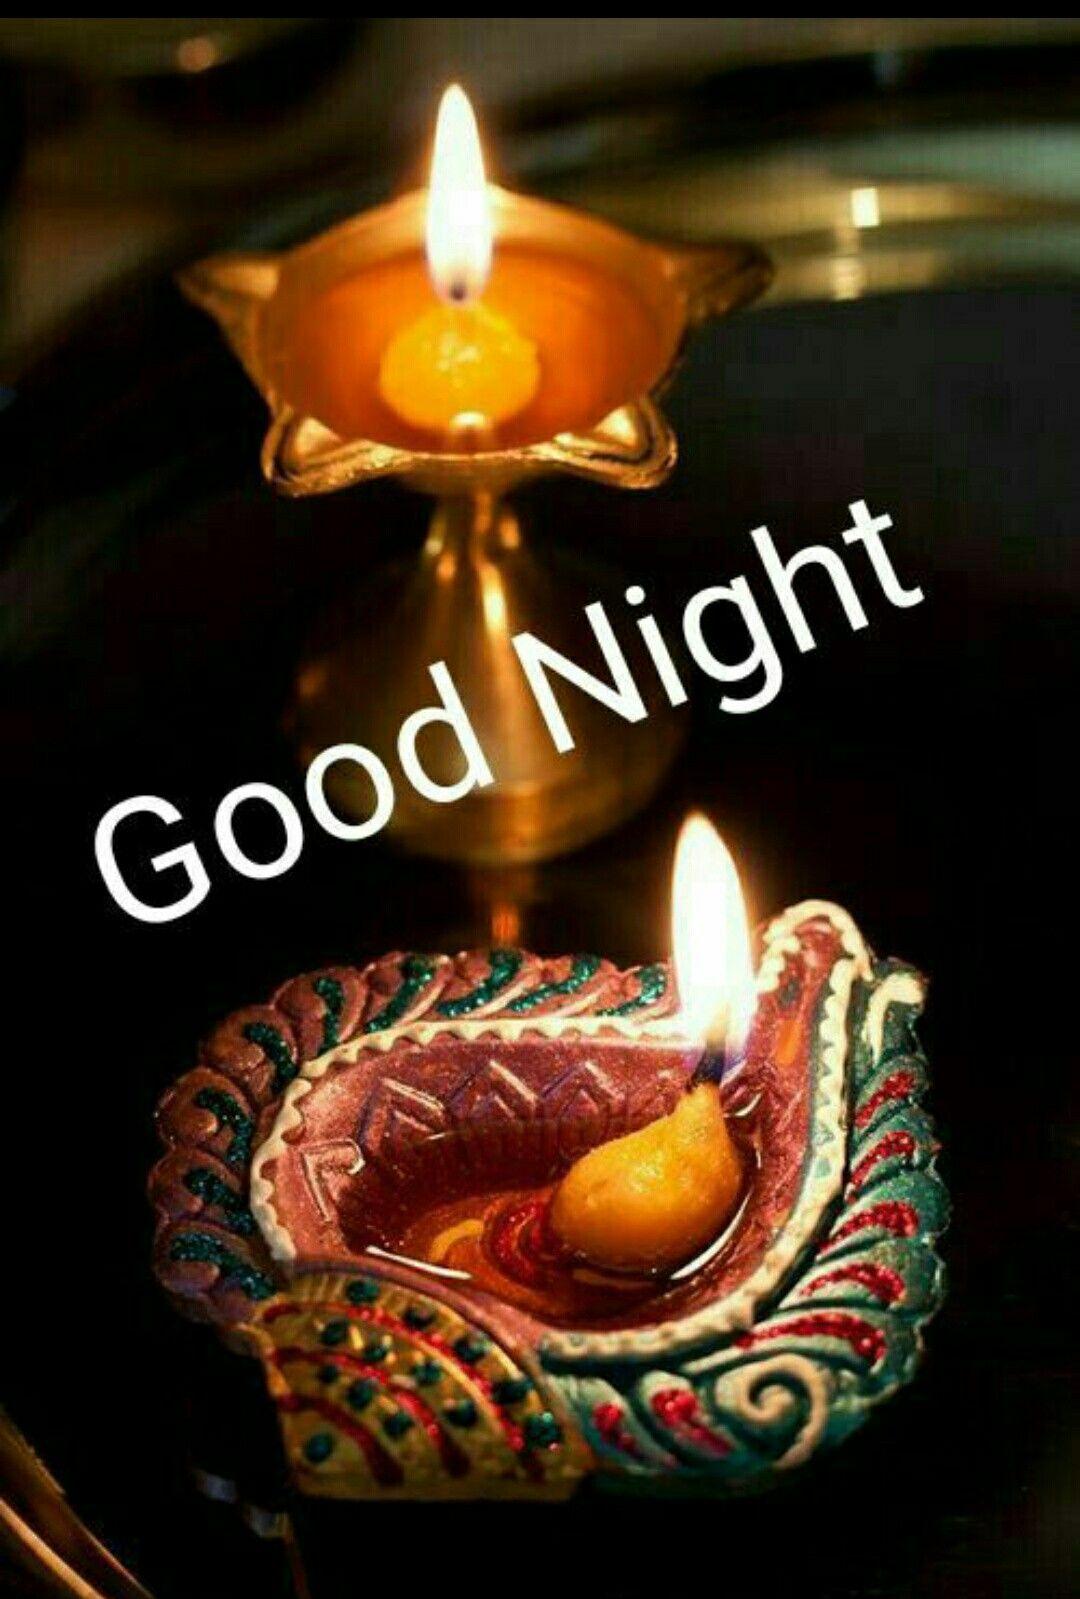 Pin by gopesh avasthi on night pinterest good night good